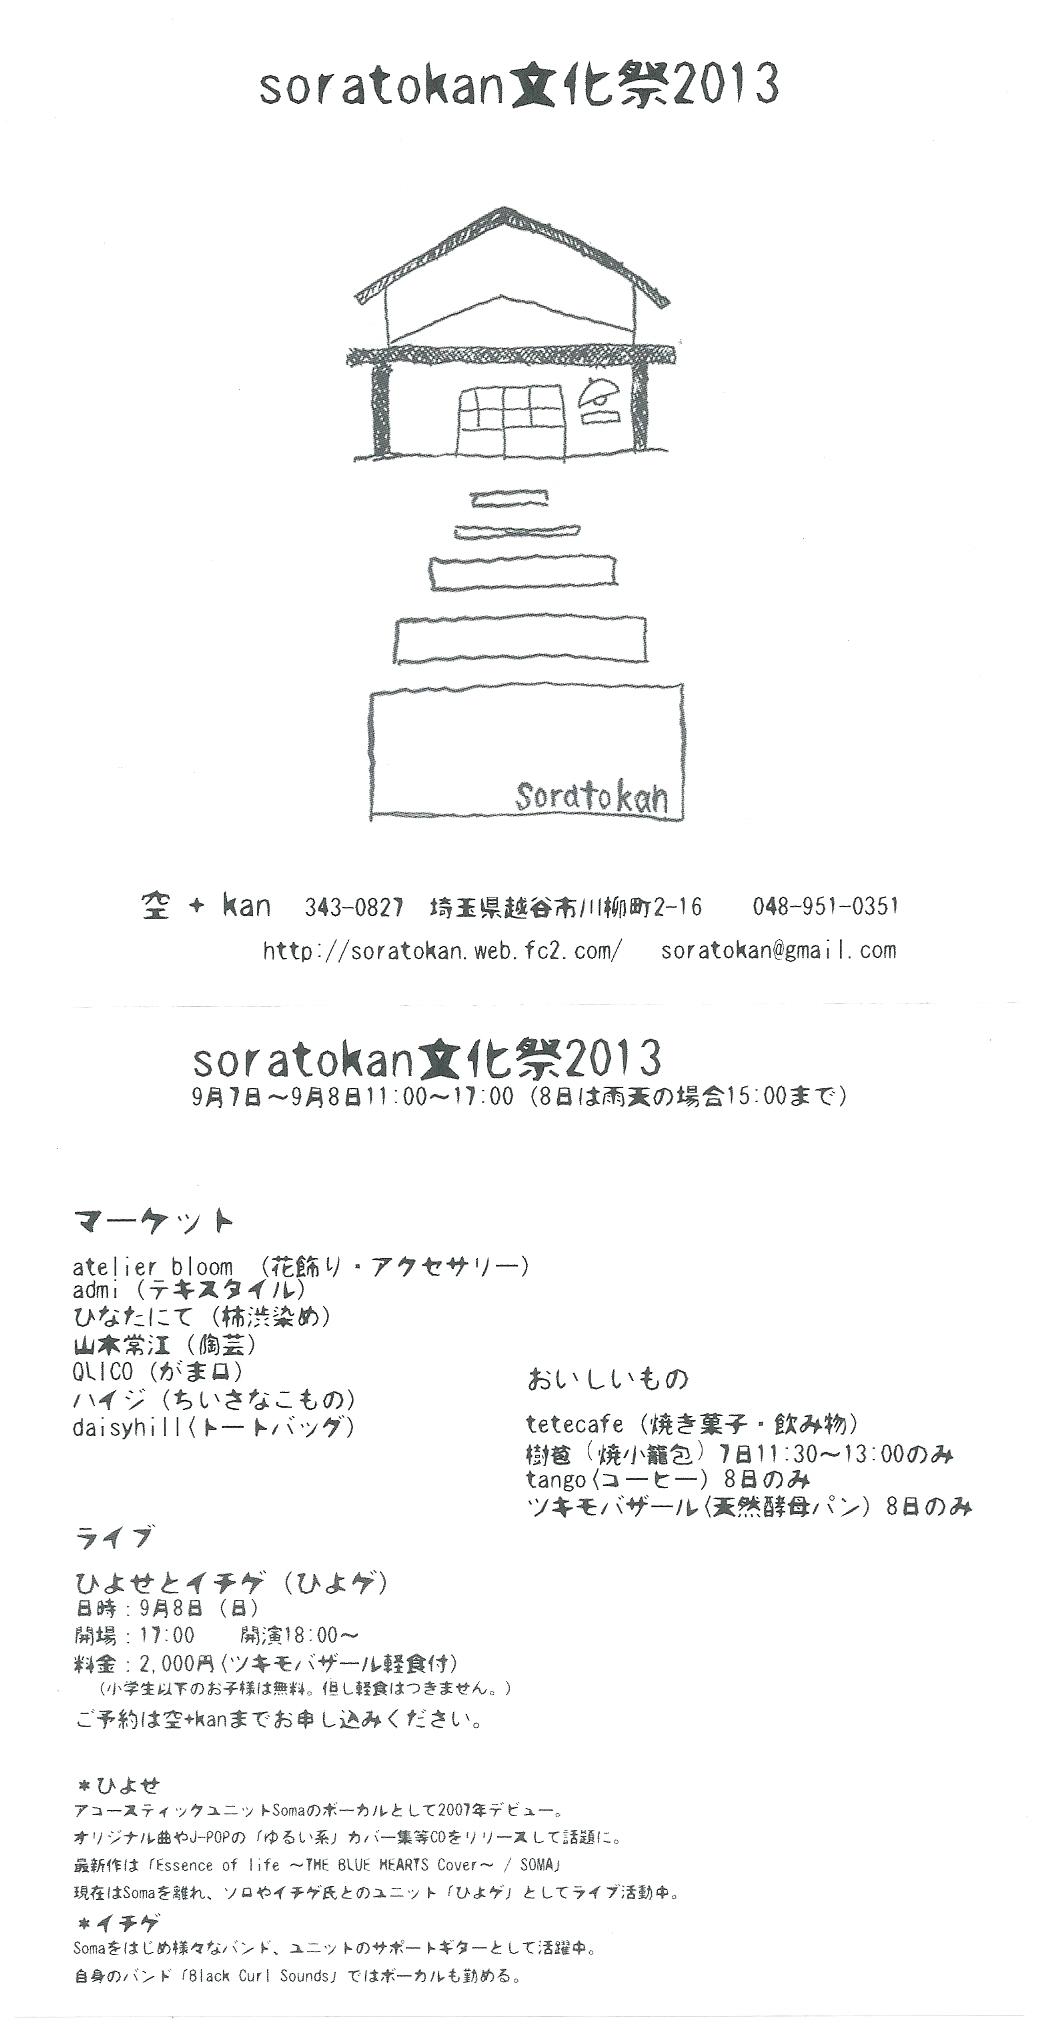 「soratokan文化祭2013」_b0241033_14335684.jpg